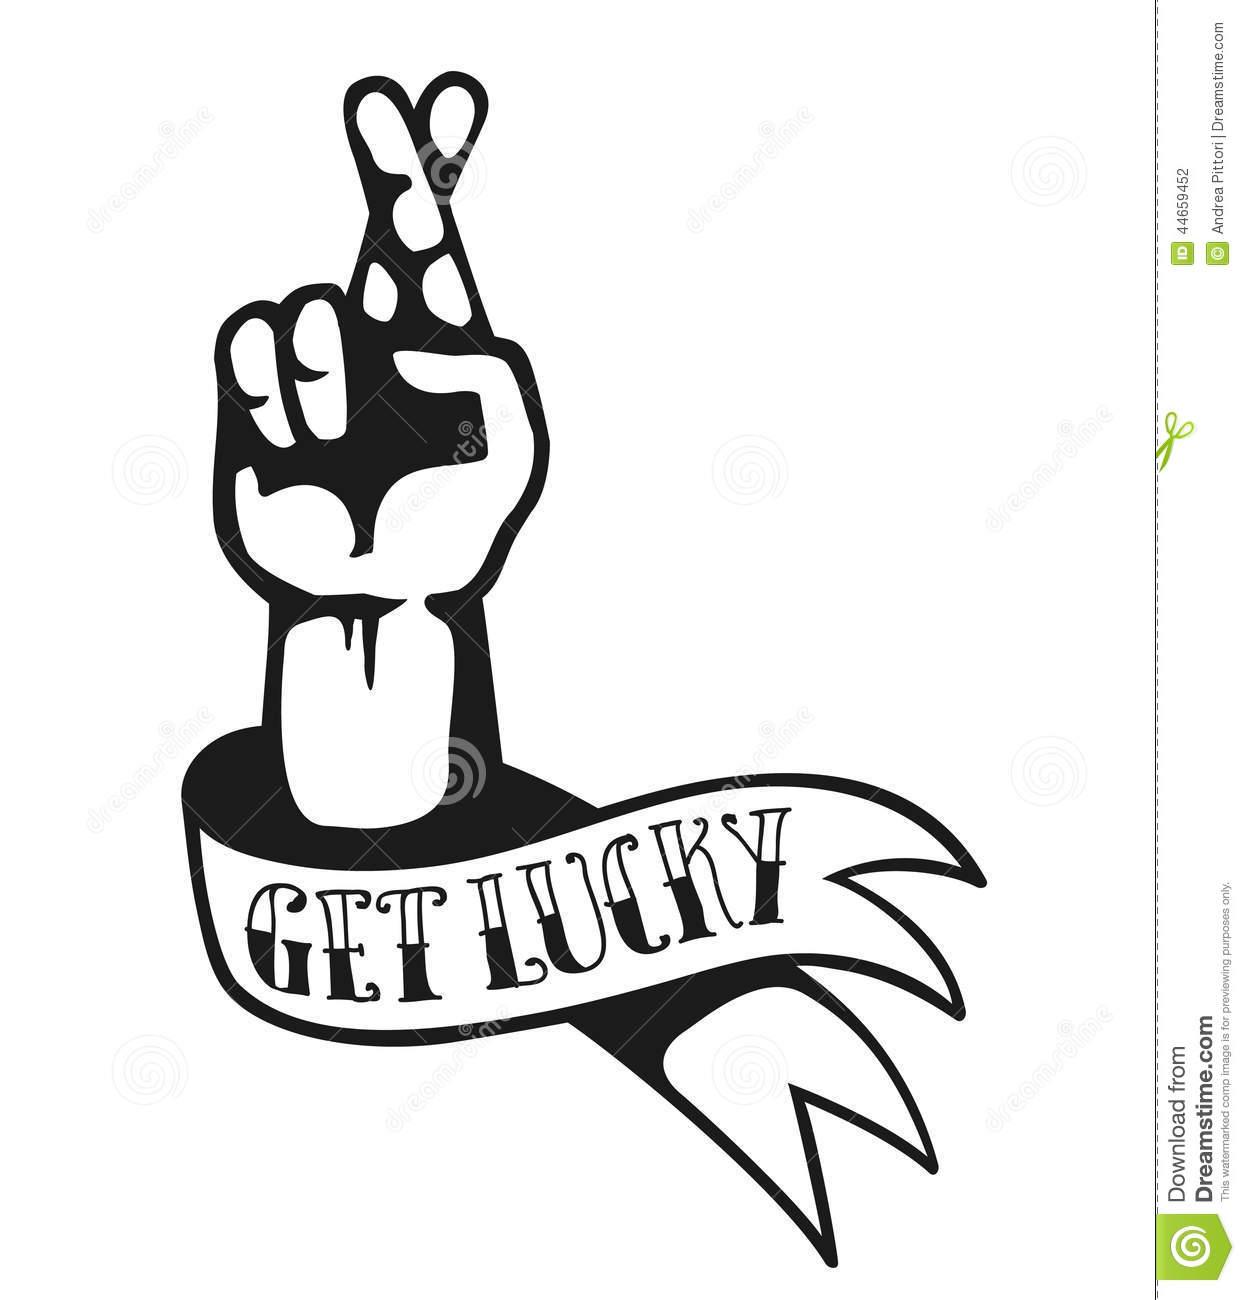 get-lucky-hope-funky-tattoo-design-hand-fingers-....jpg